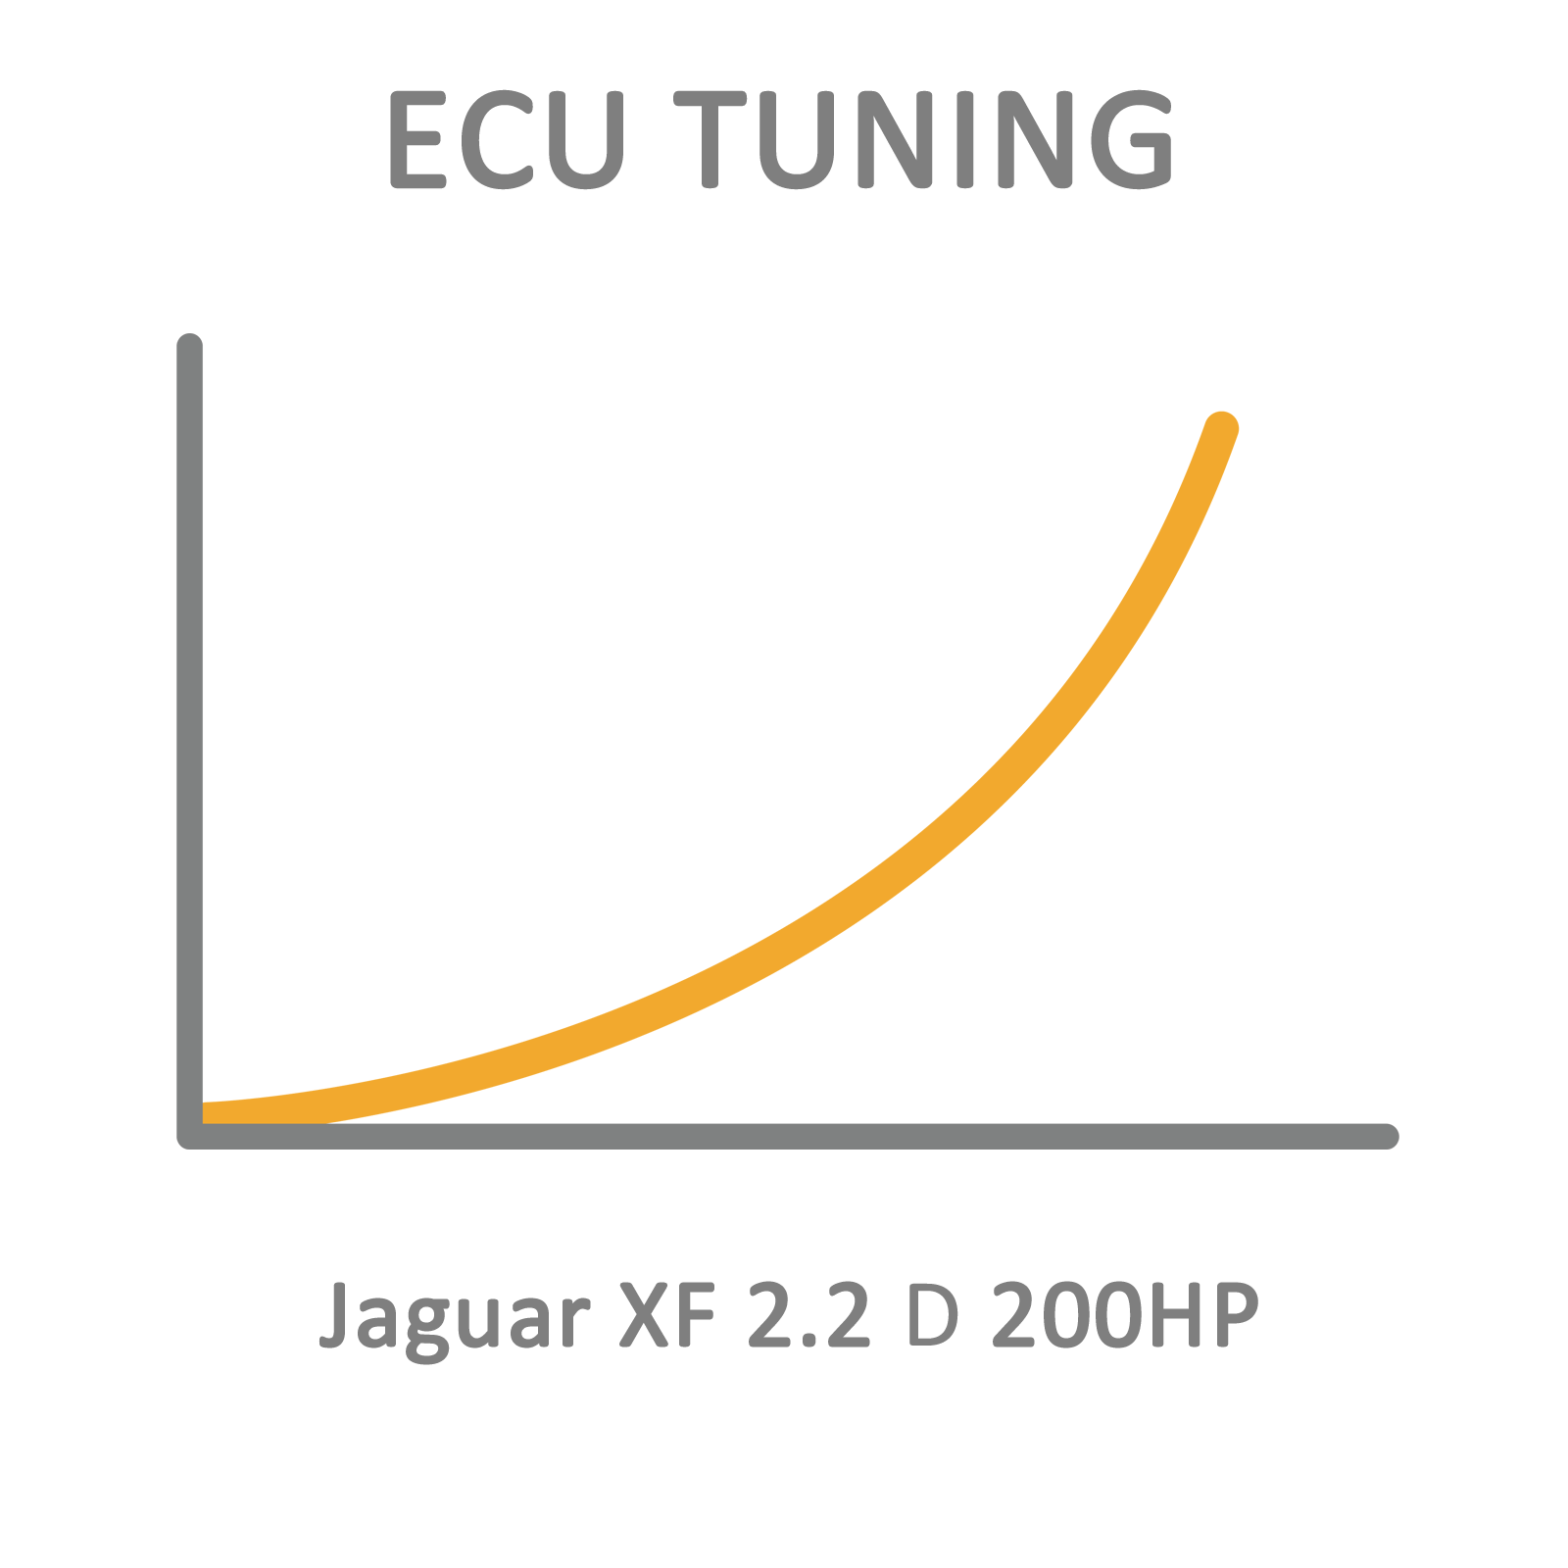 Jaguar XF 2.2 D 200HP ECU Tuning Remapping Programming